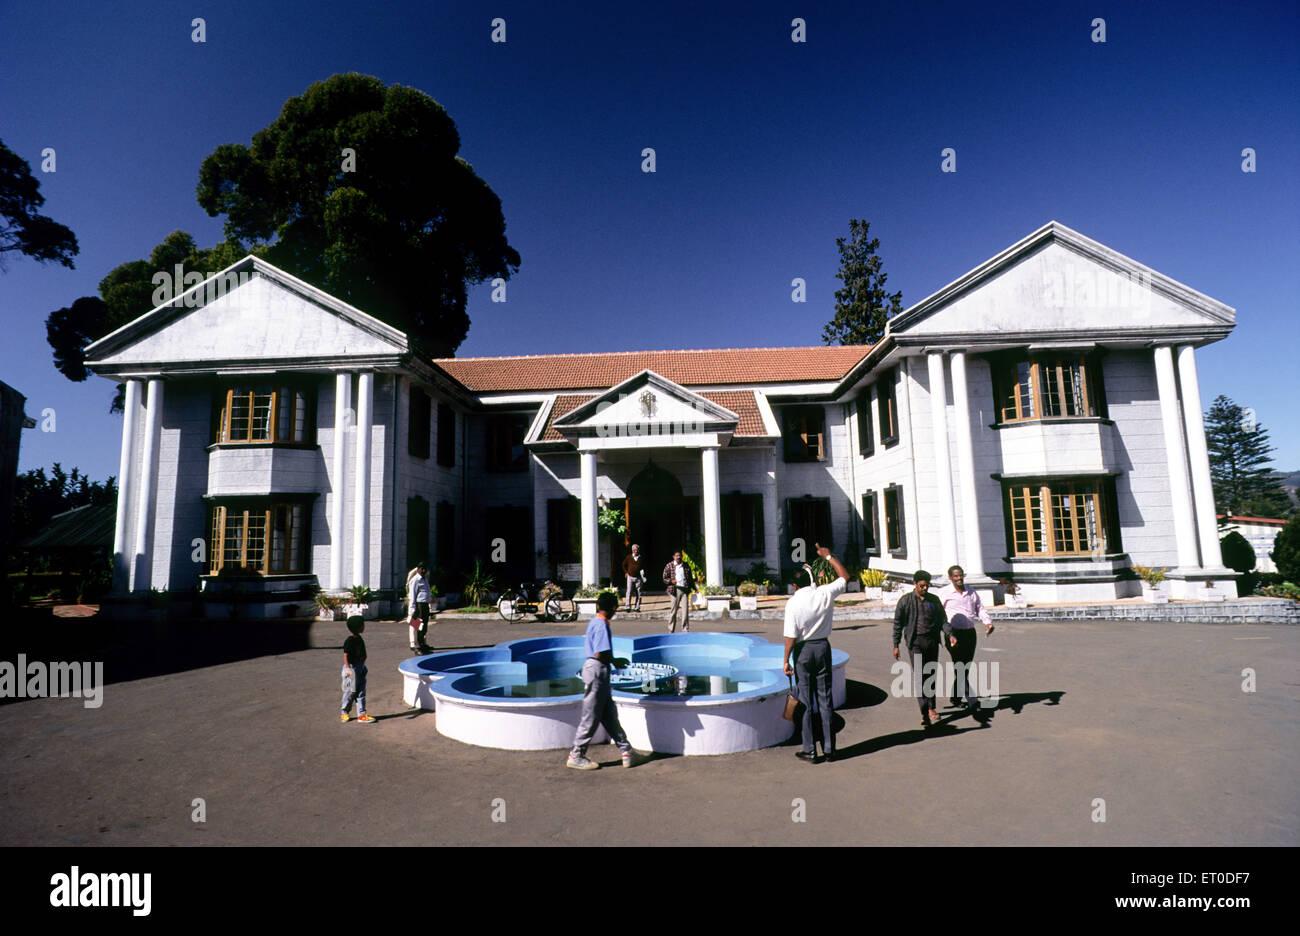 Naciones UPASI planters Association of Southern India Nilgiris ; Connor ; ; ; de Tamil Nadu, India Imagen De Stock